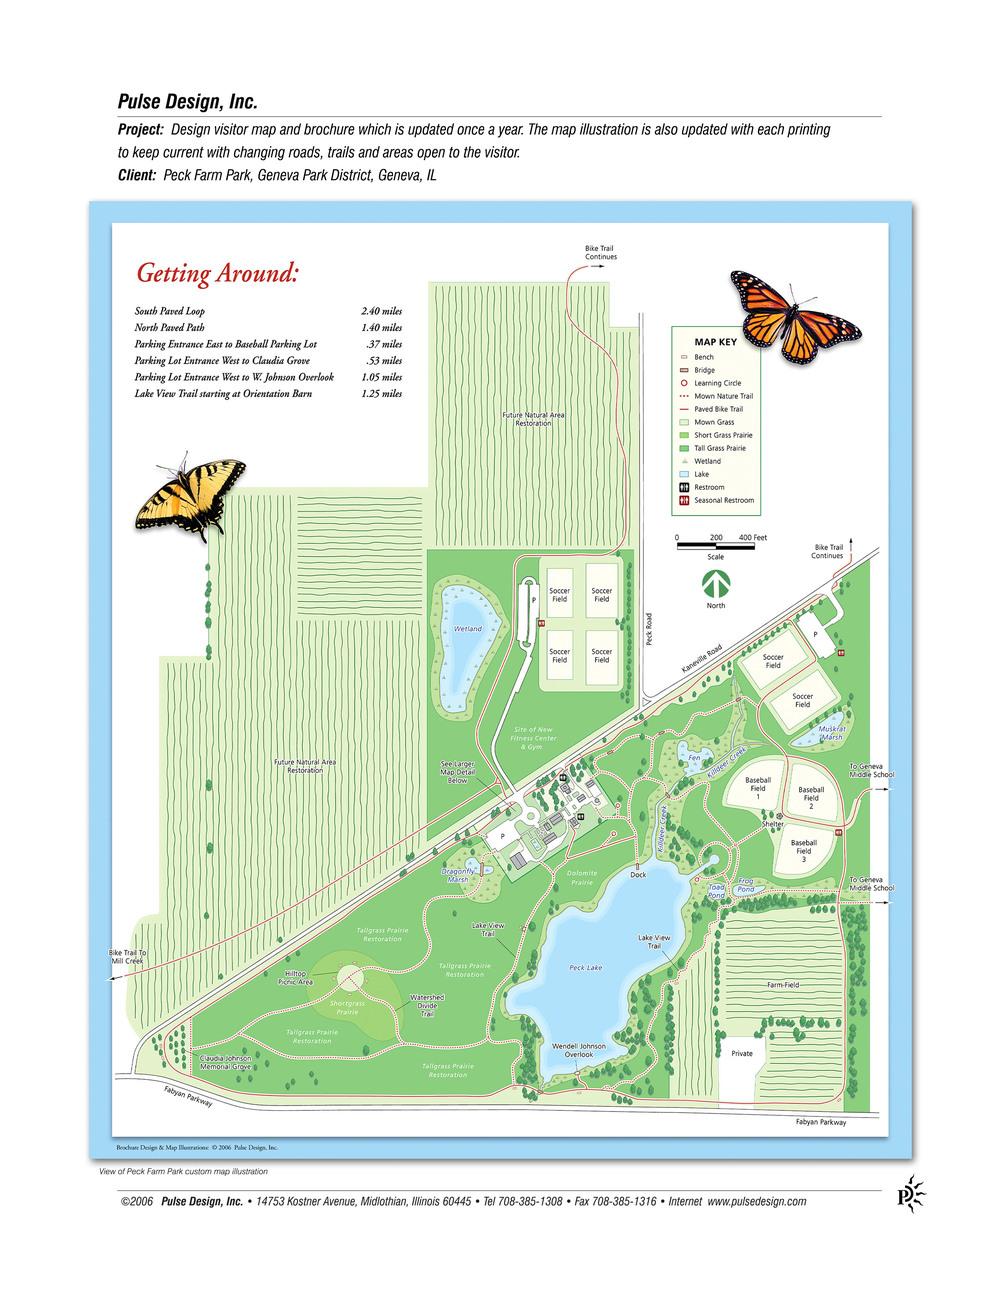 Peck-Farm-Brochure-Map-3-Pulse-Design-Inc.jpg